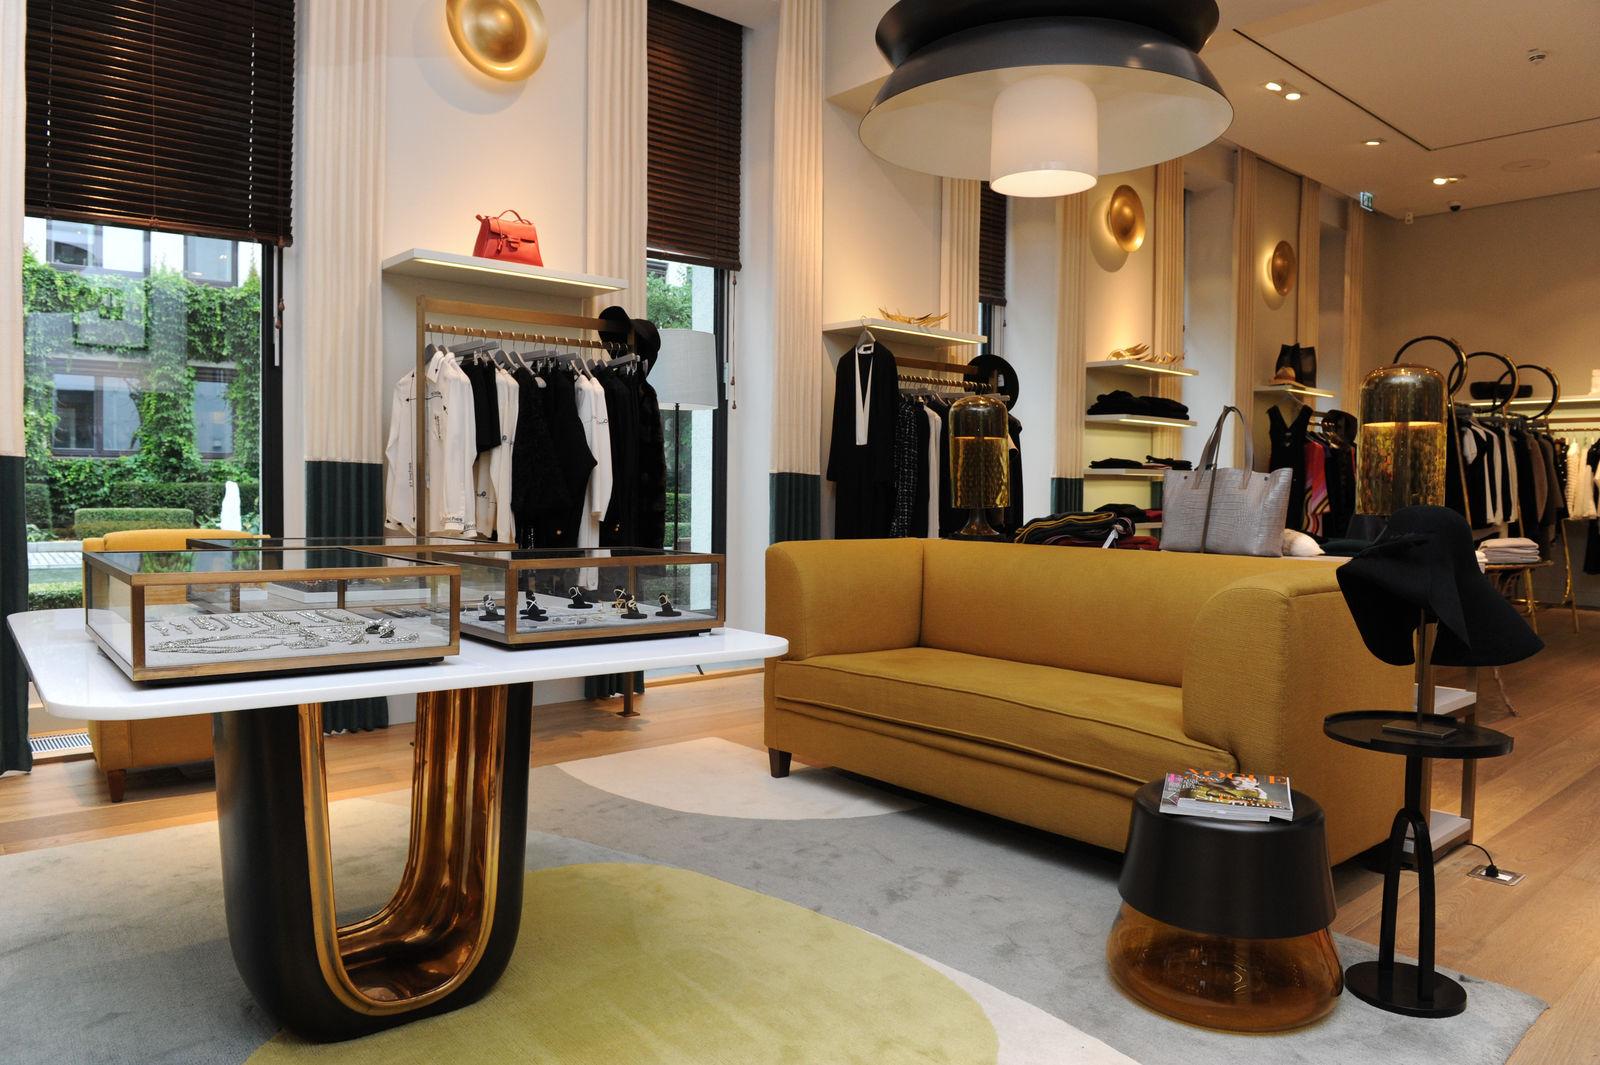 APROPOS The Concept Store in München (Bild 9)